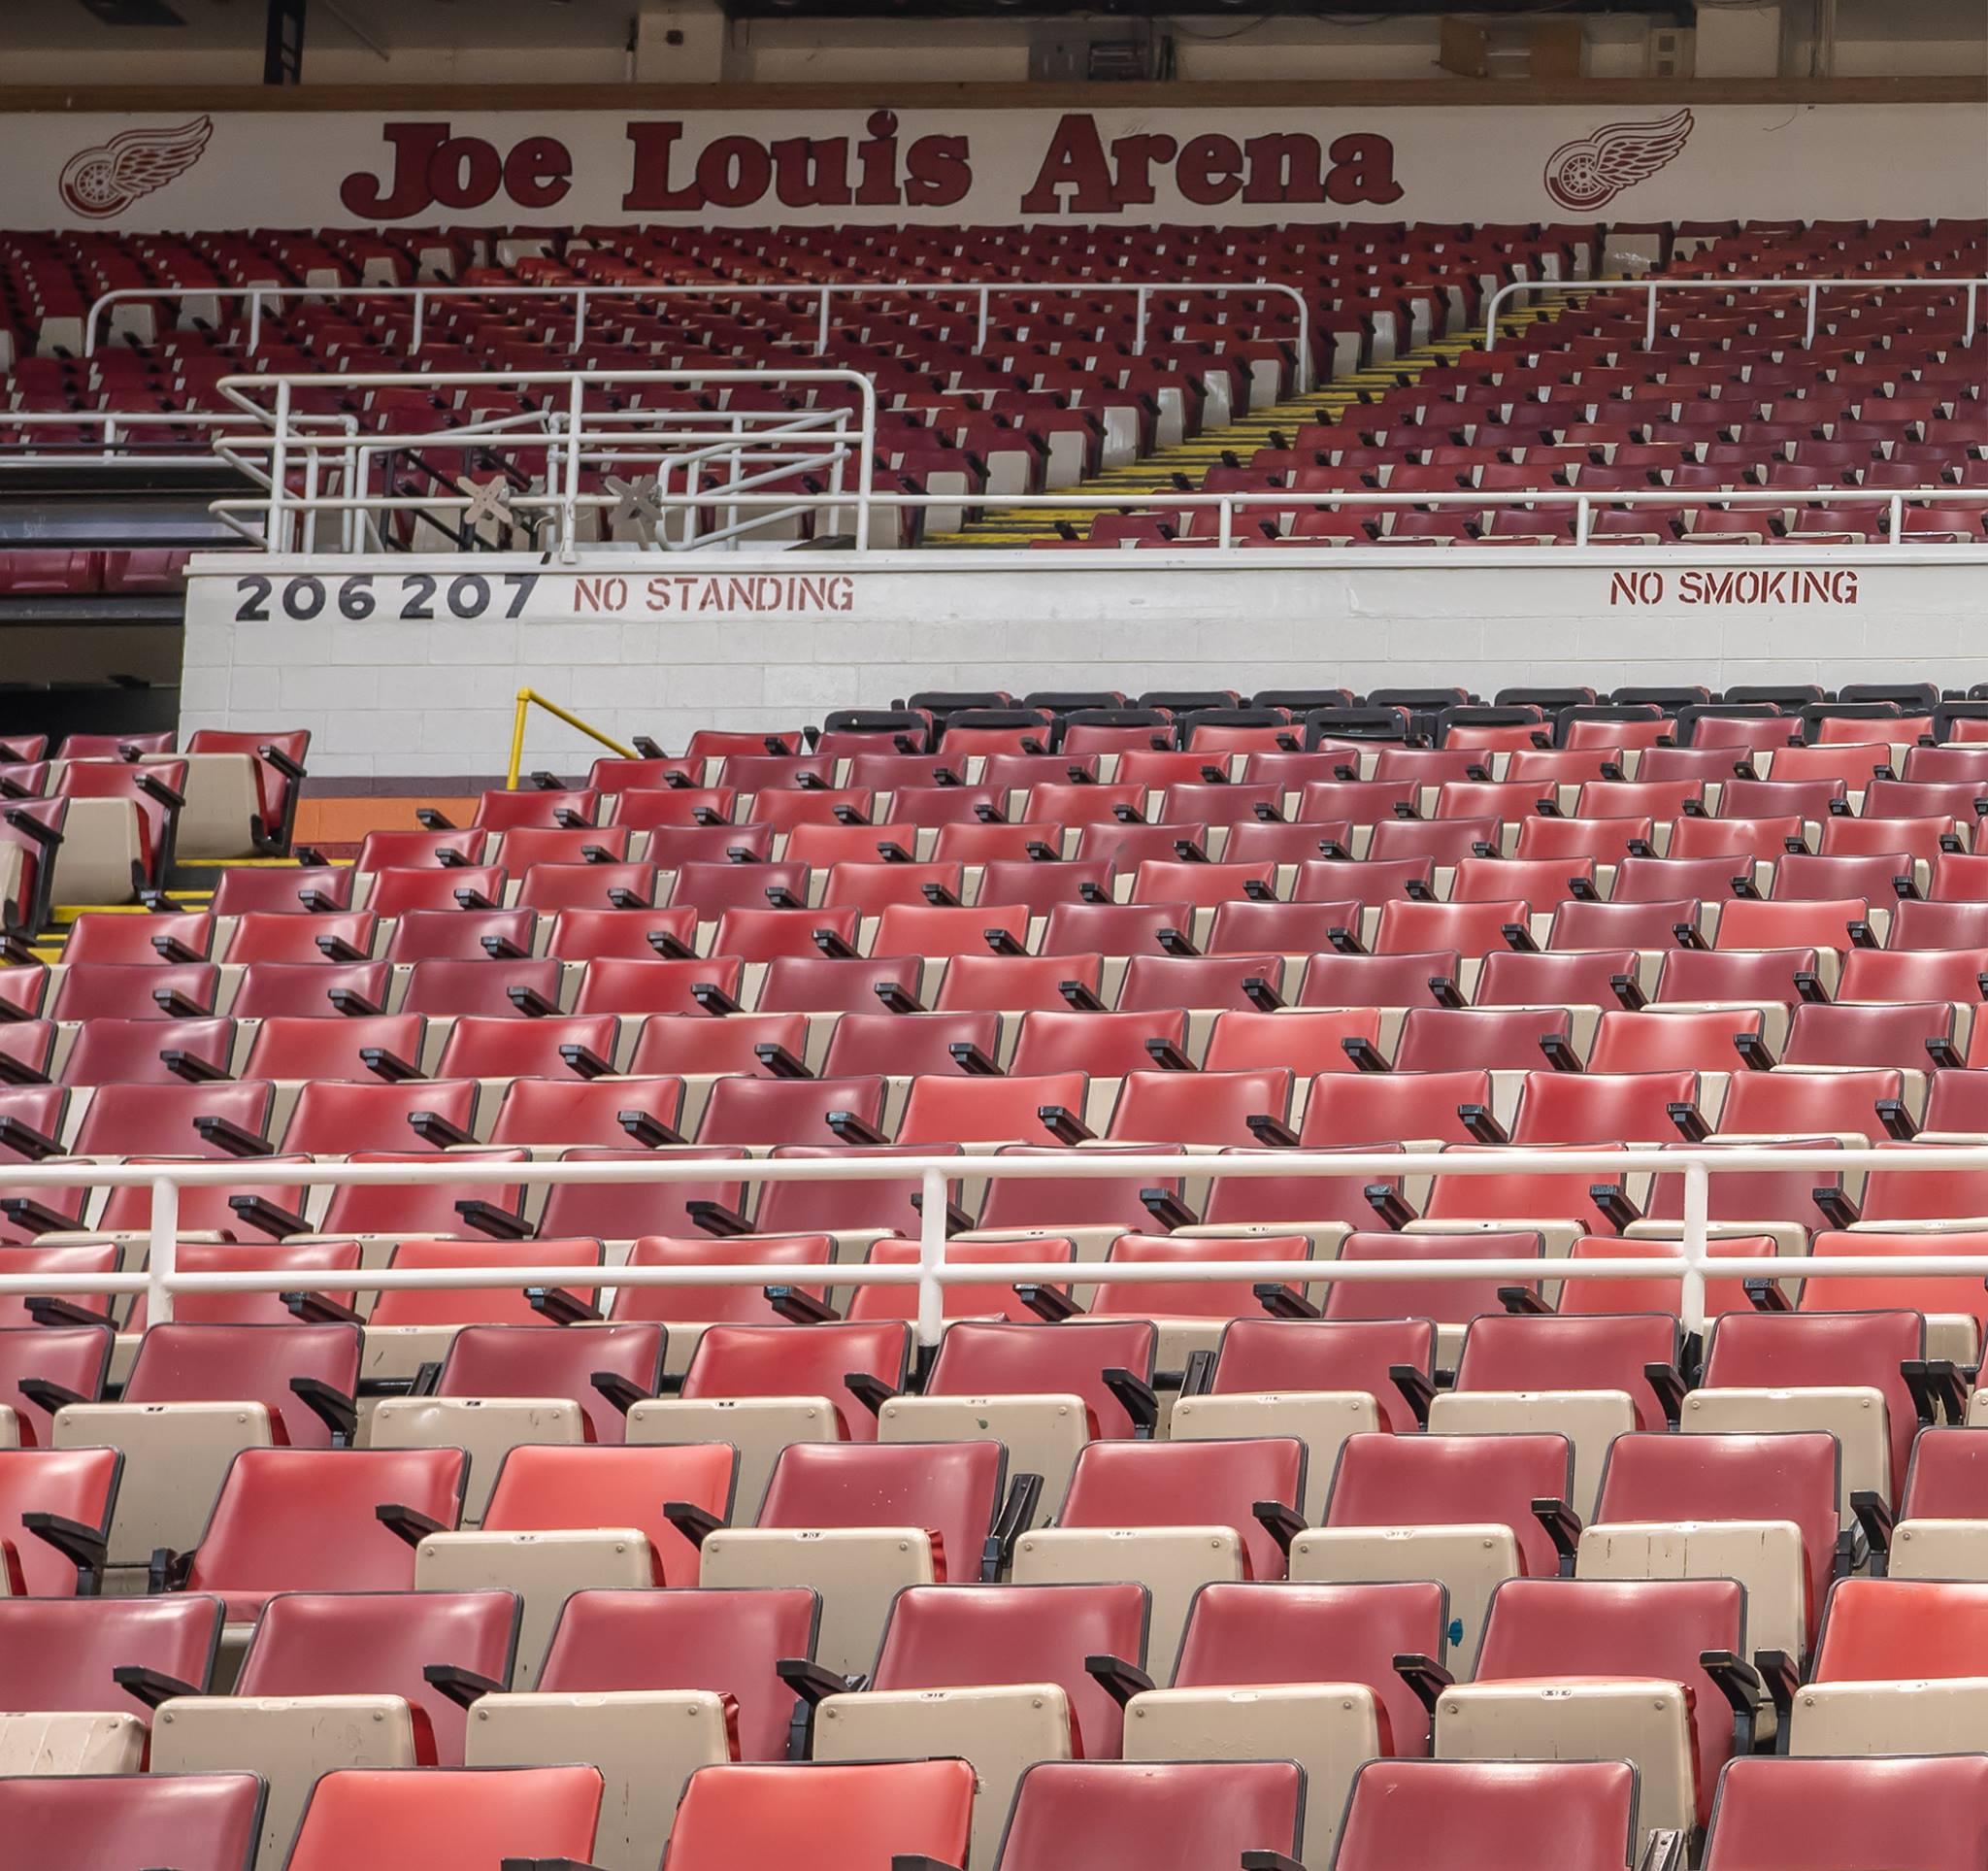 Buy Iconic Joe Louis Arena Seats!